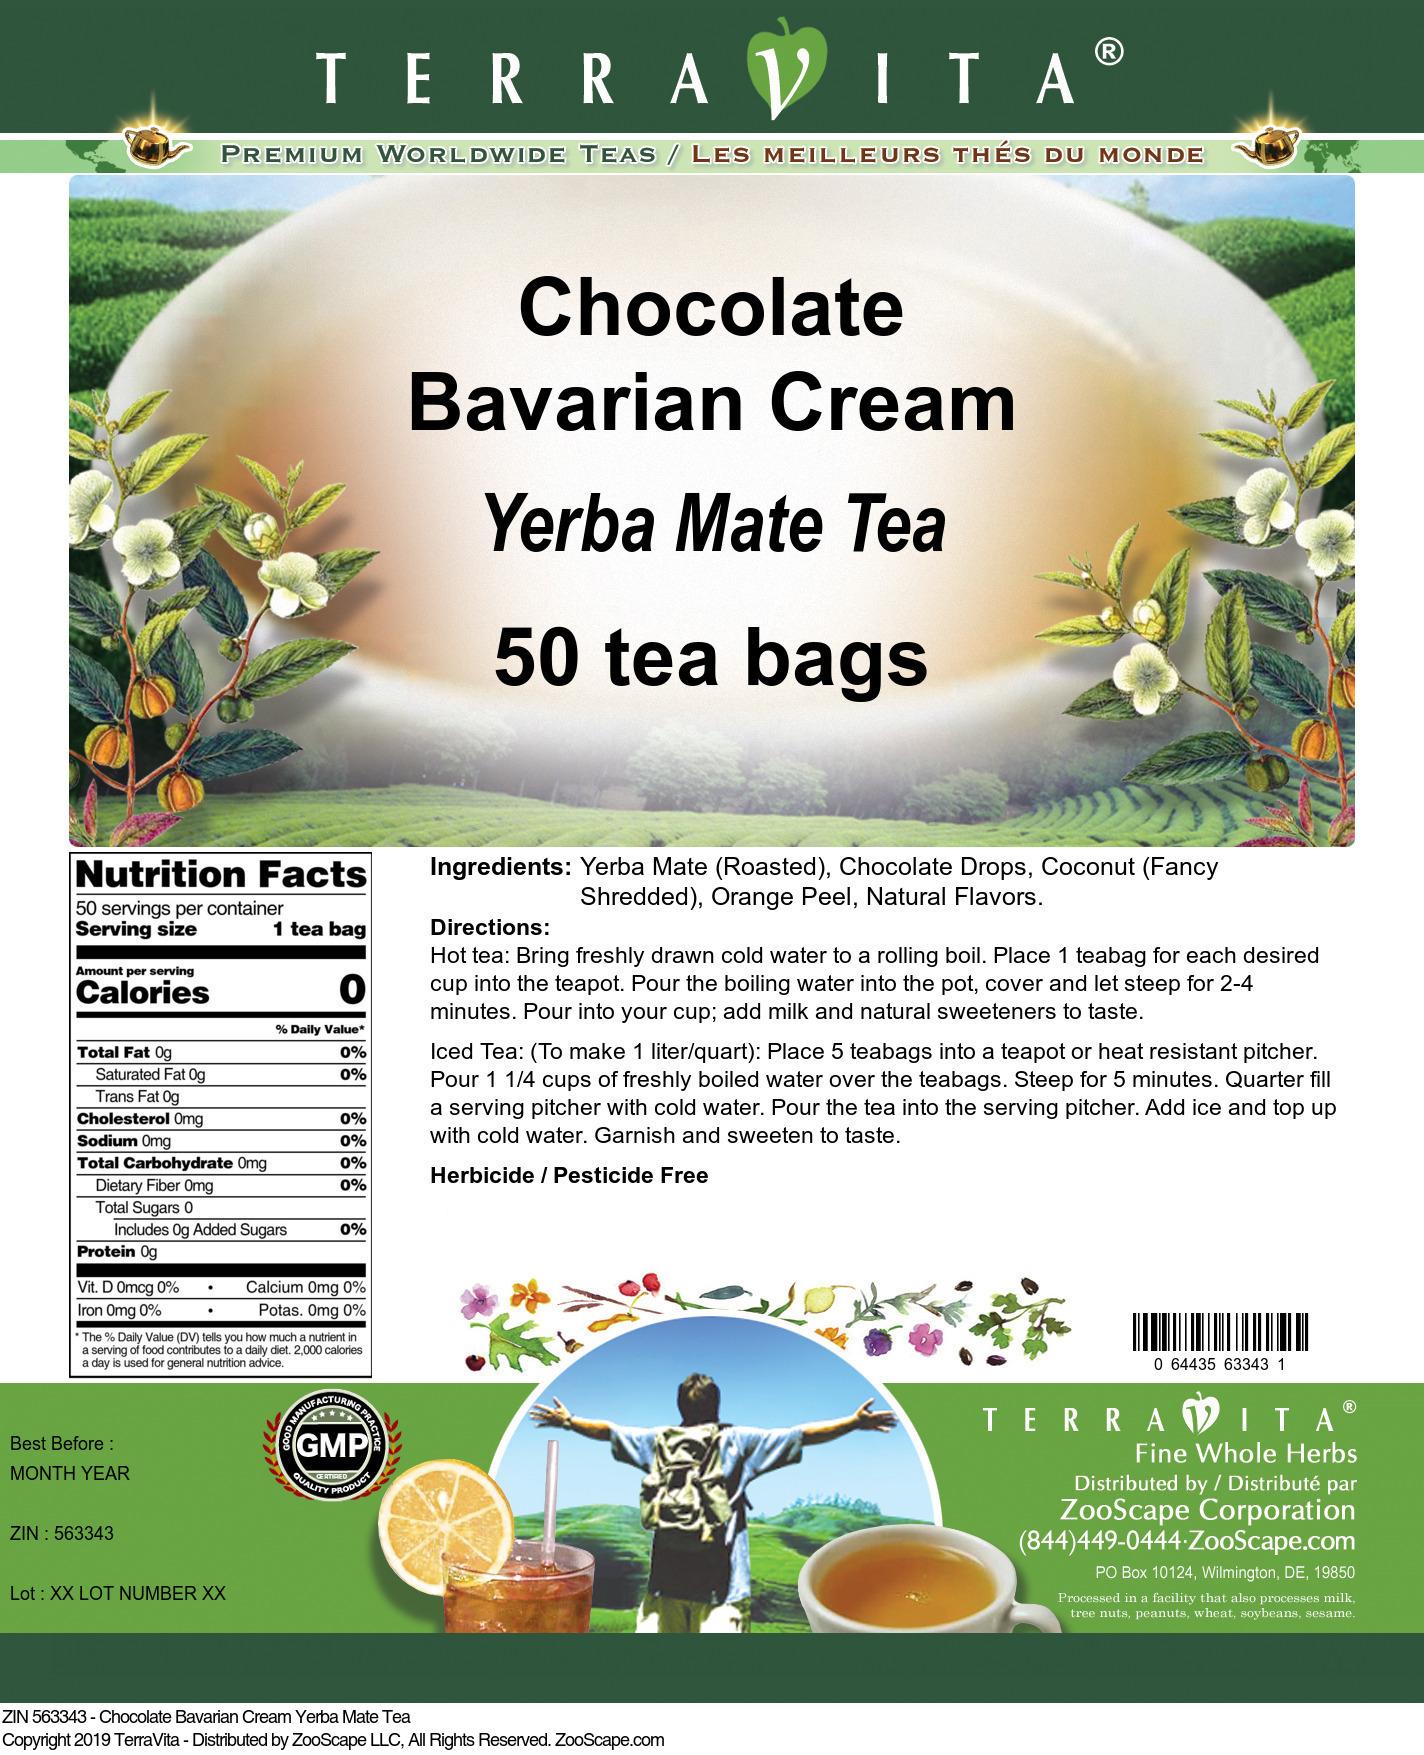 Chocolate Bavarian Cream Yerba Mate Tea